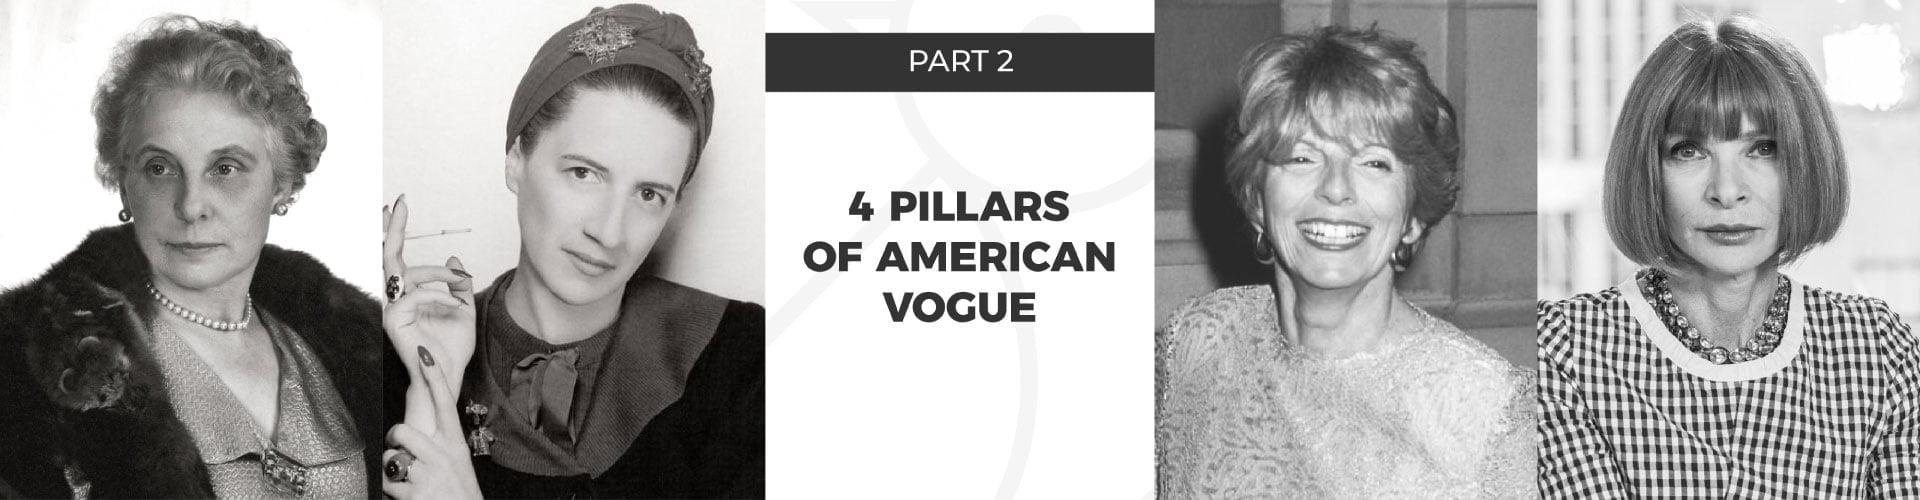 4 pillars of American Vogue - part 2